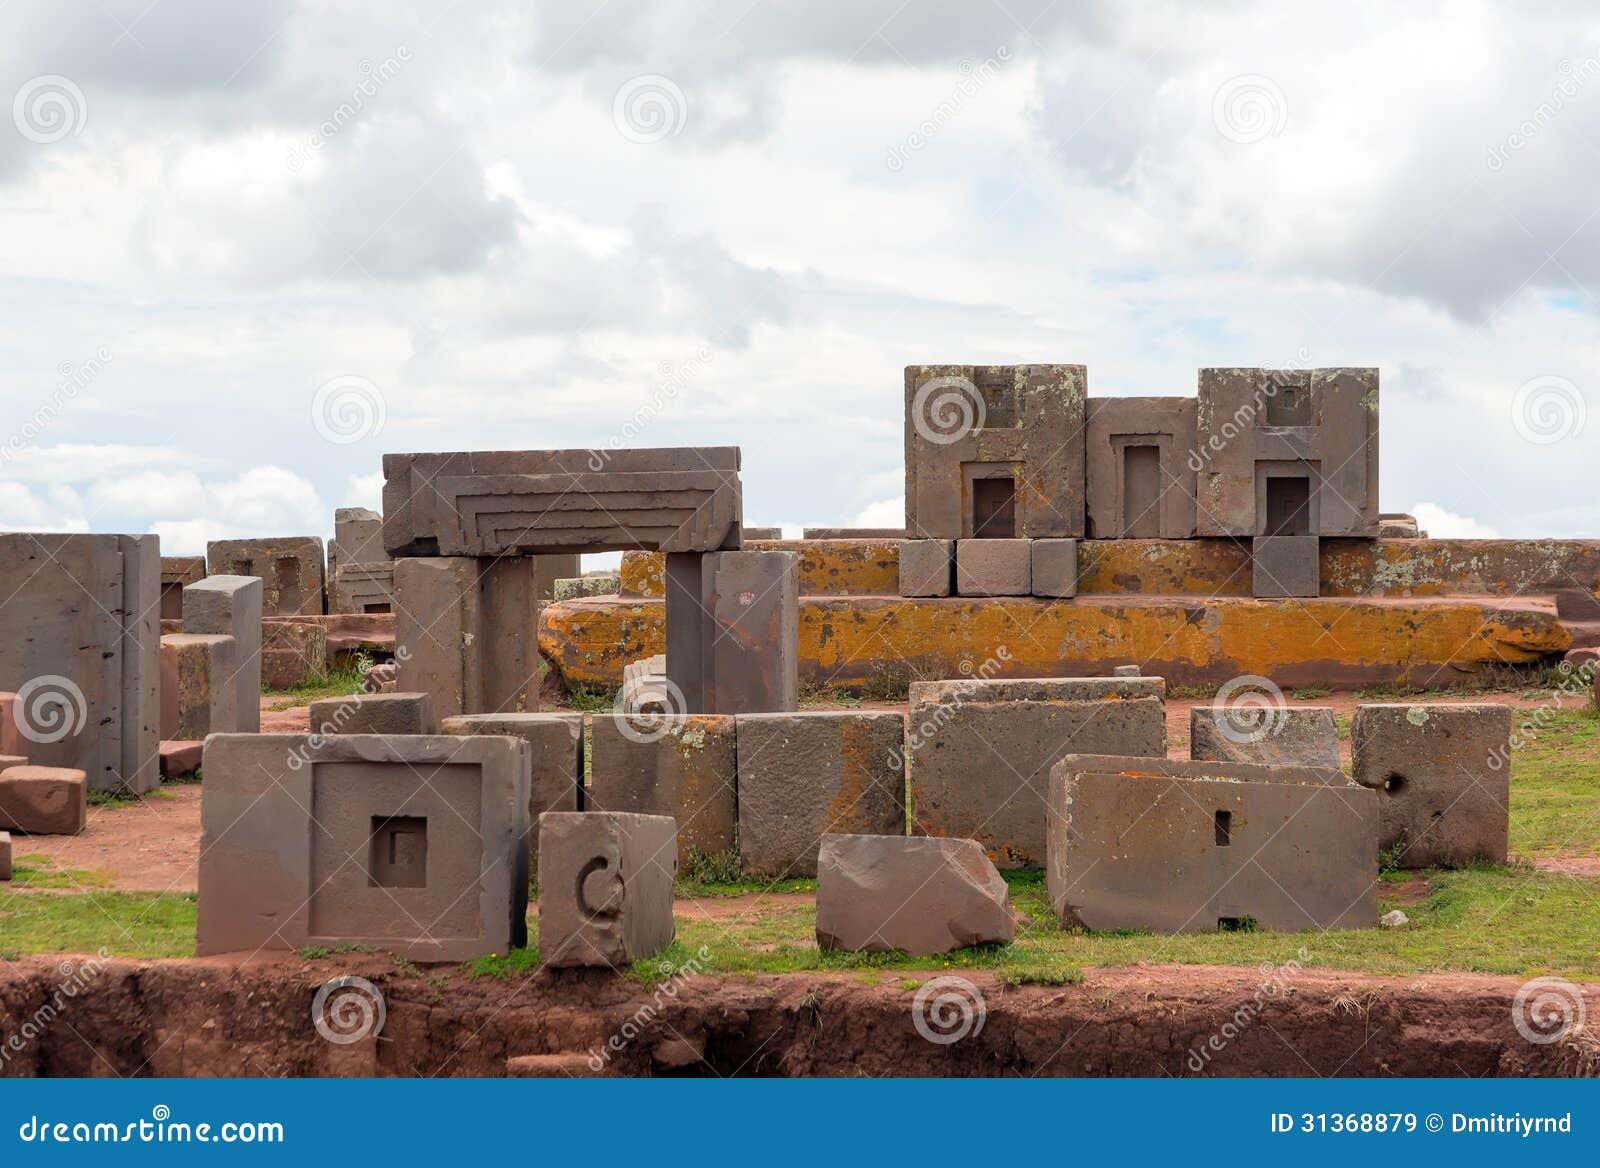 Megalithic stone complex puma punku bolivia stock image